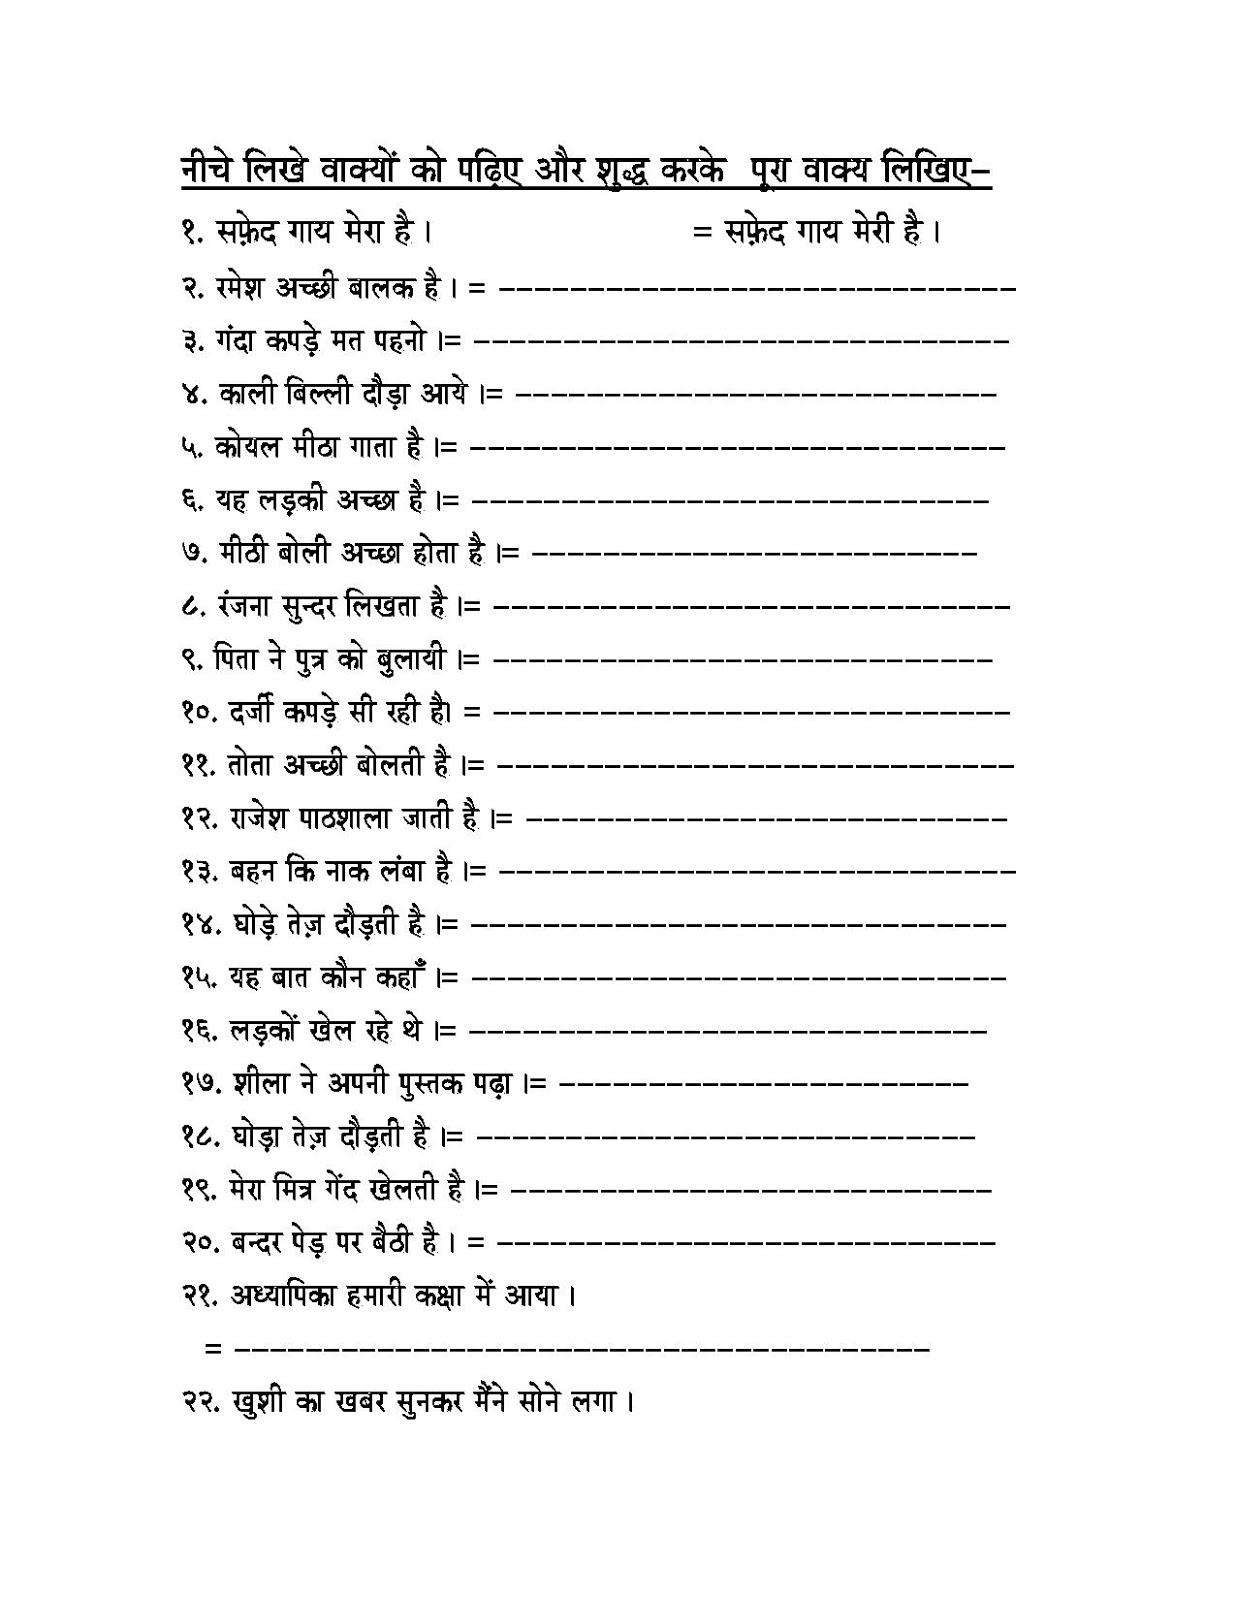 medium resolution of 100+  Grade 1 Hindi Worksheets    Free Fun Worksheets For Kids Free Fun  Printable Hindi Worksheet